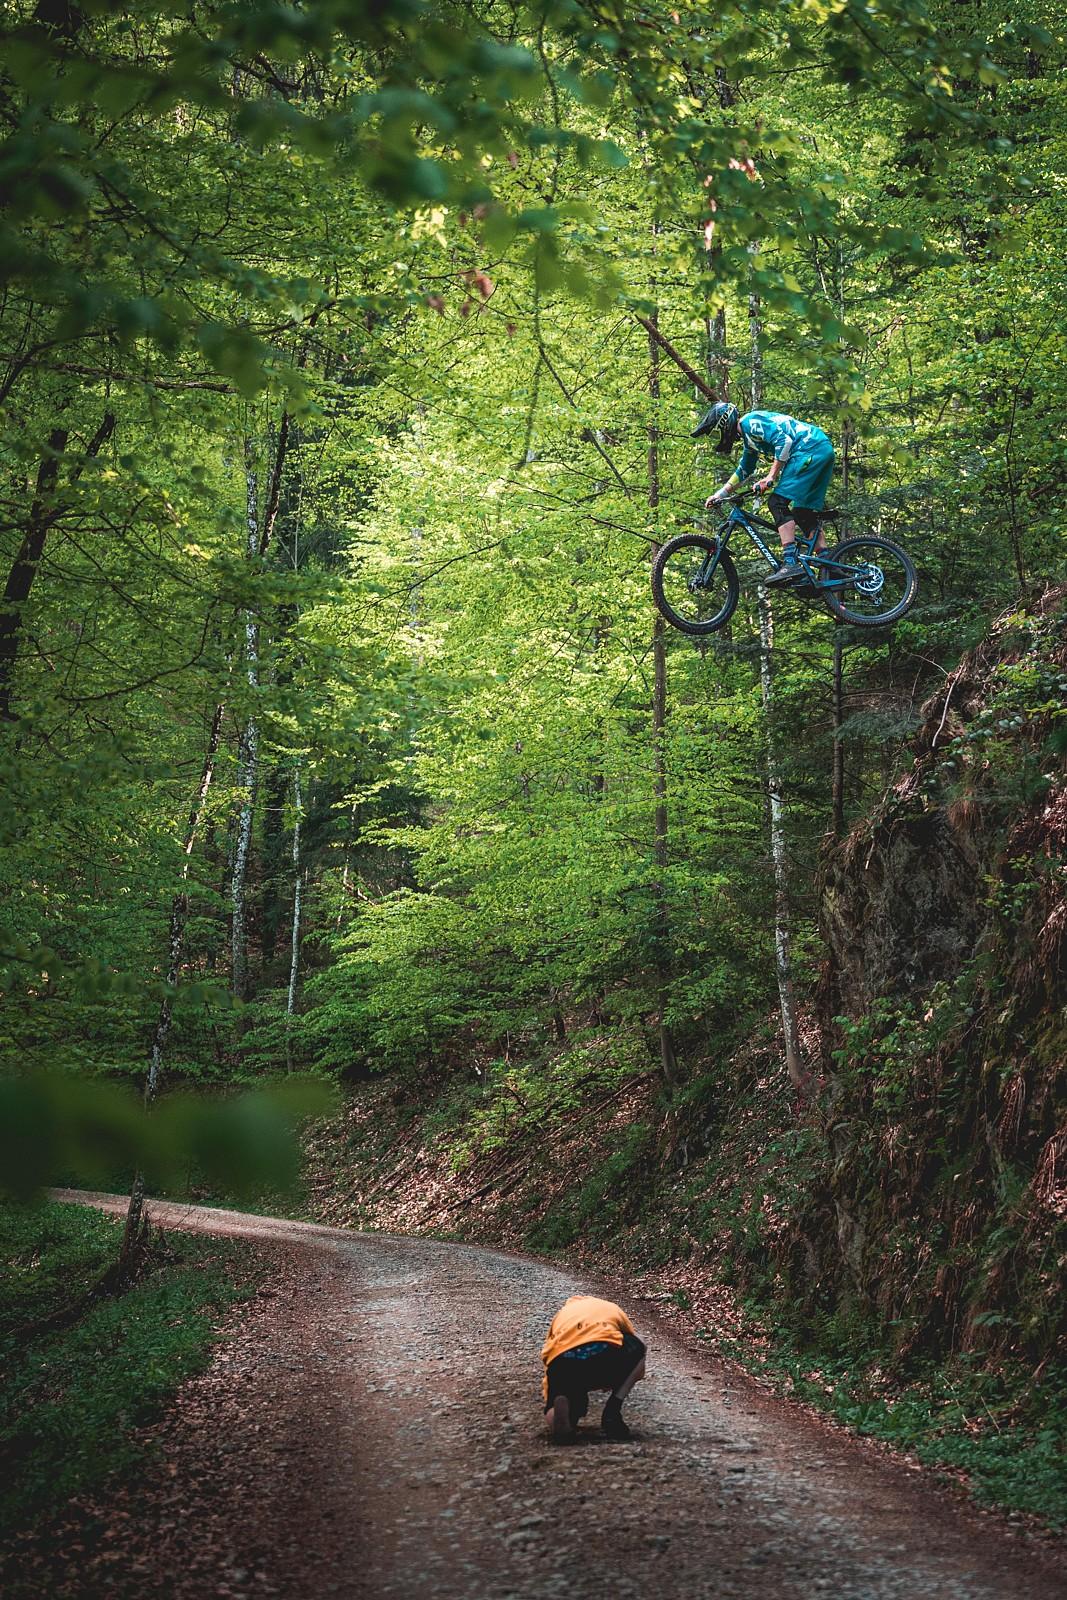 DSC00342 - bubaswan - Mountain Biking Pictures - Vital MTB